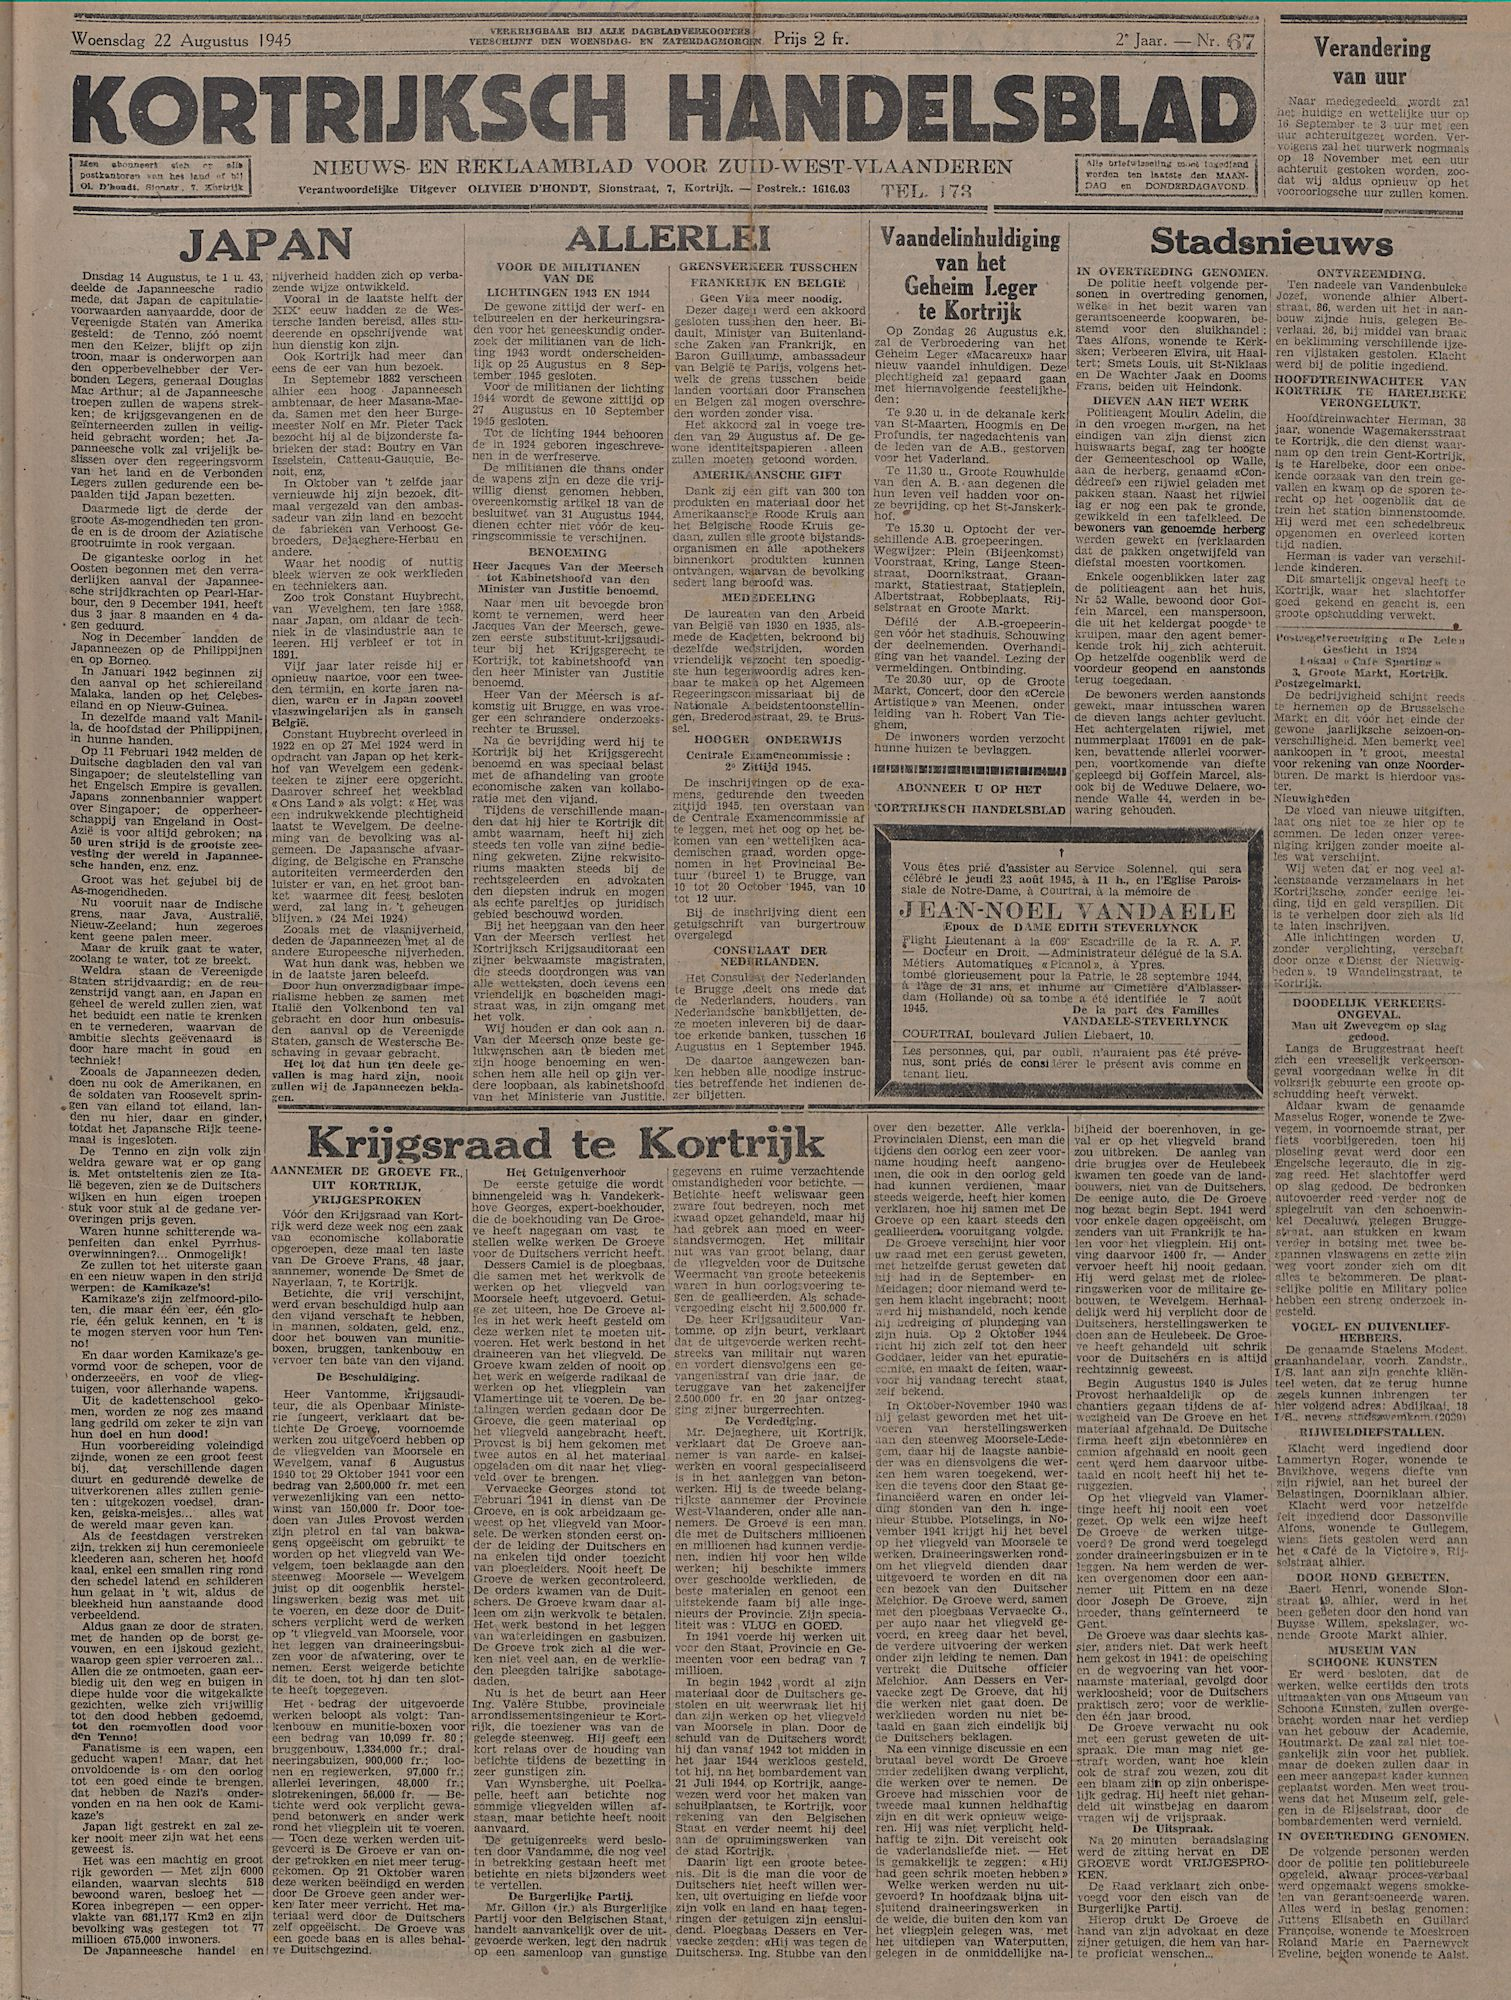 Kortrijksch Handelsblad 22 augustus 1945 Nr67 p1